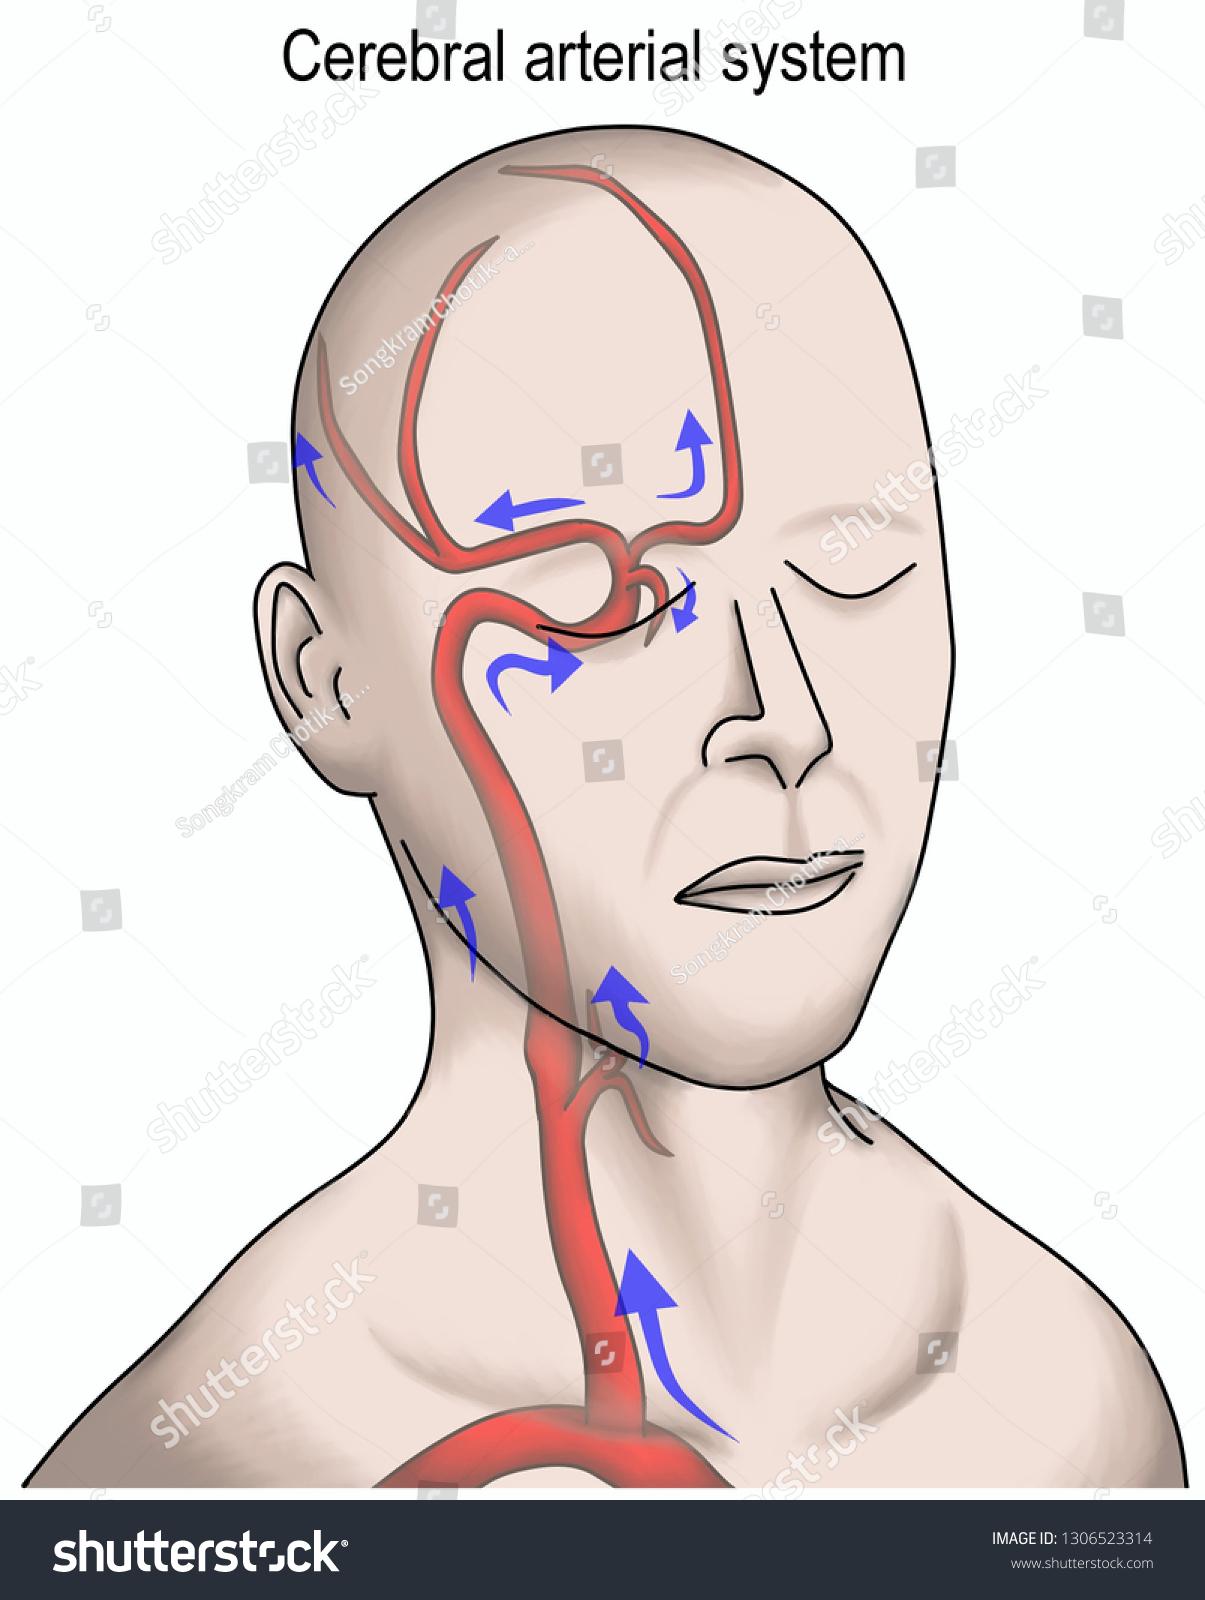 Royalty Free Stock Illustration Of Arterial System Feeding Brain